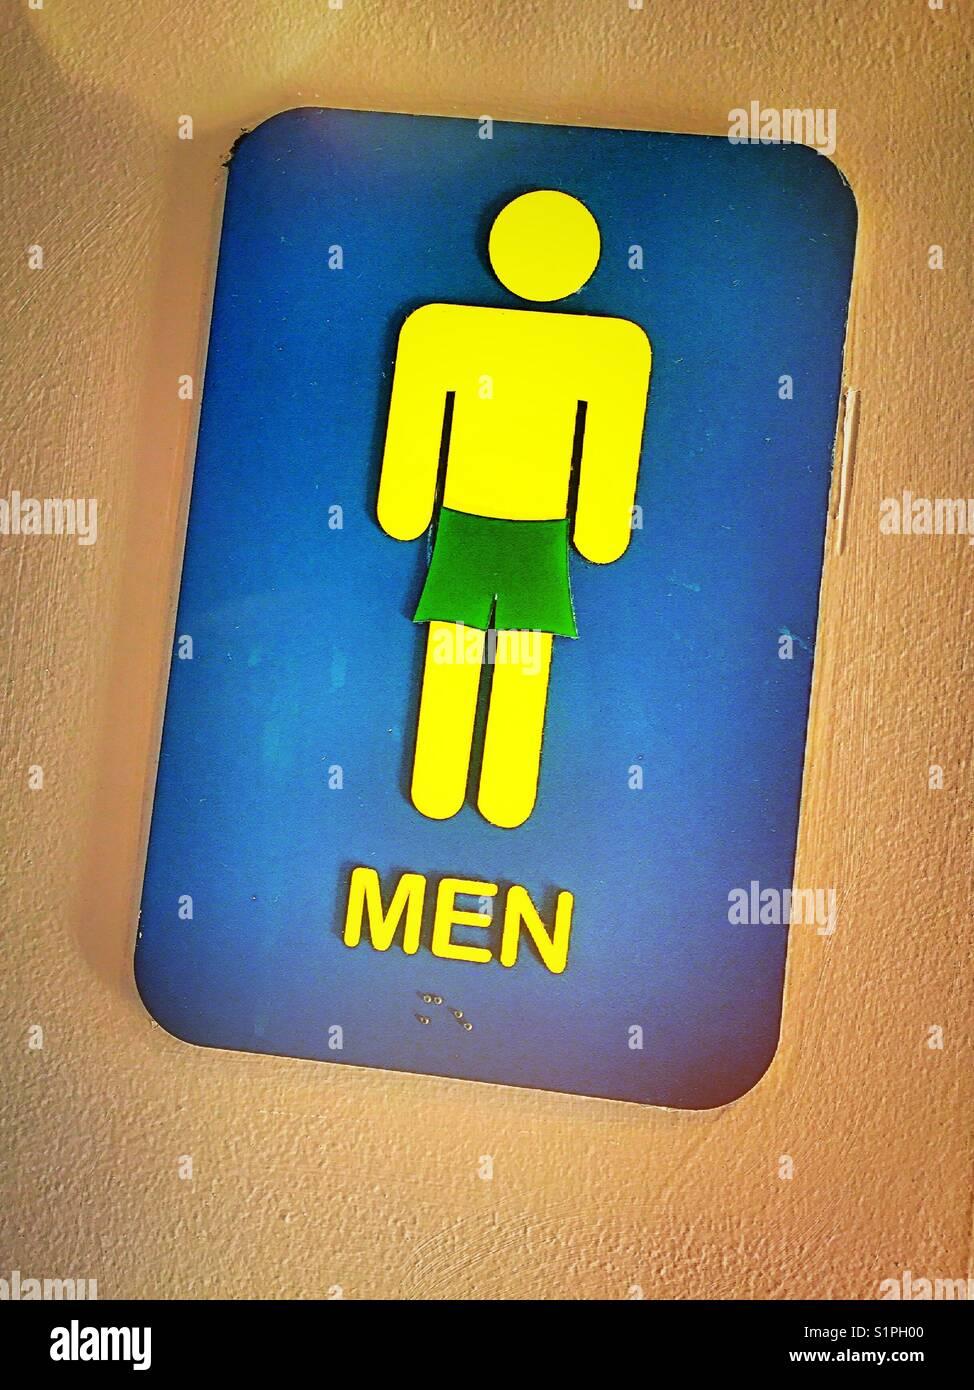 Bunte Piktogramm, öffentliche Männer bad sign, Boardwalk, Myrtle Beach, South Carolina, USA Stockbild